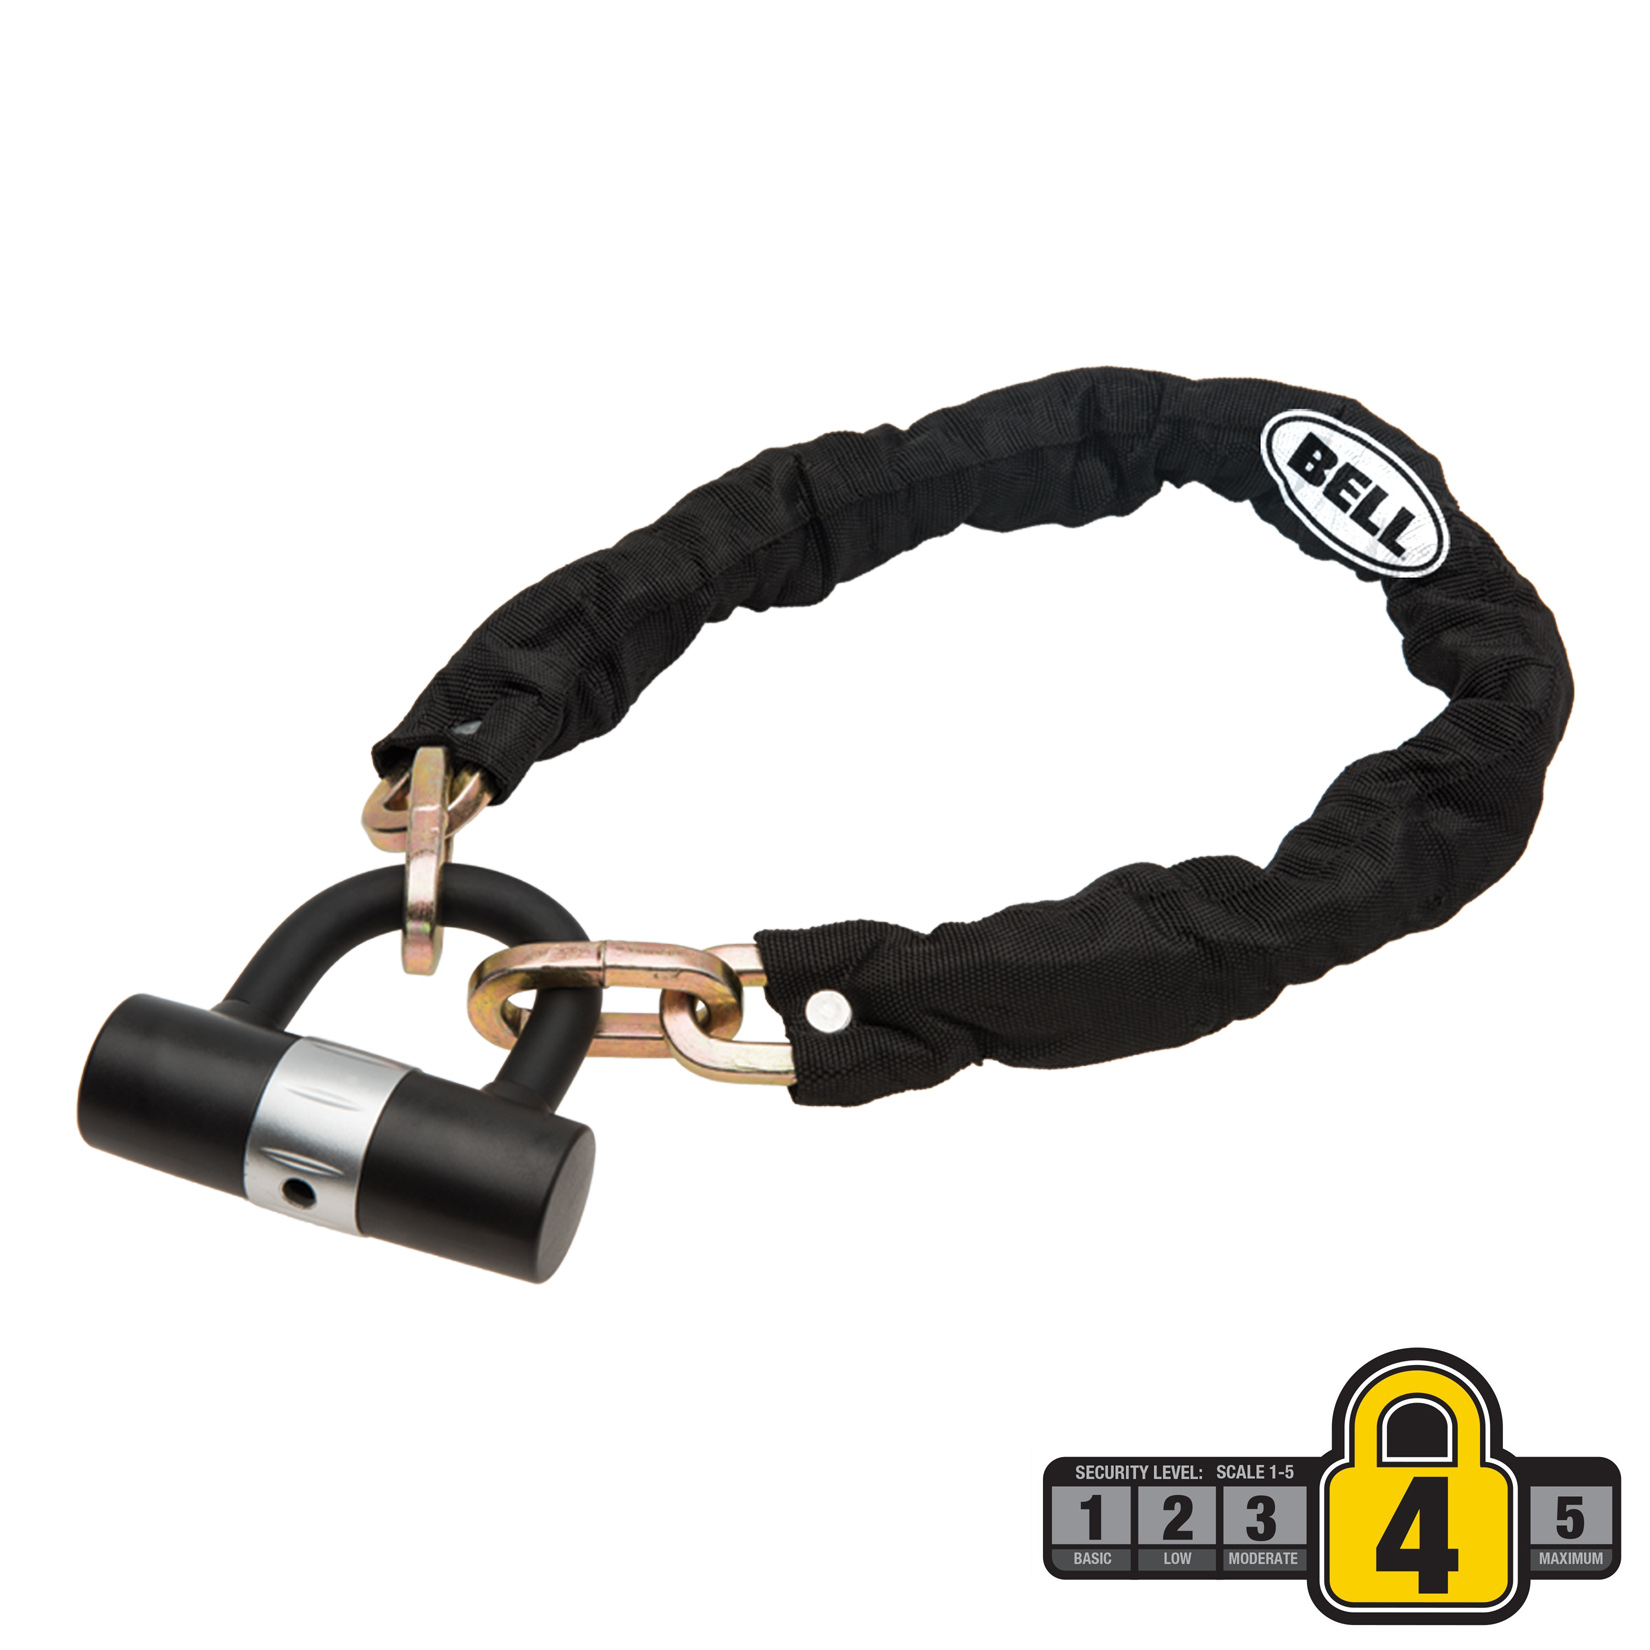 Bell Sports RAMPAGE 300 3' Chain/Mini U-Lock Bicycle Lock Set, Security Level 4, Black